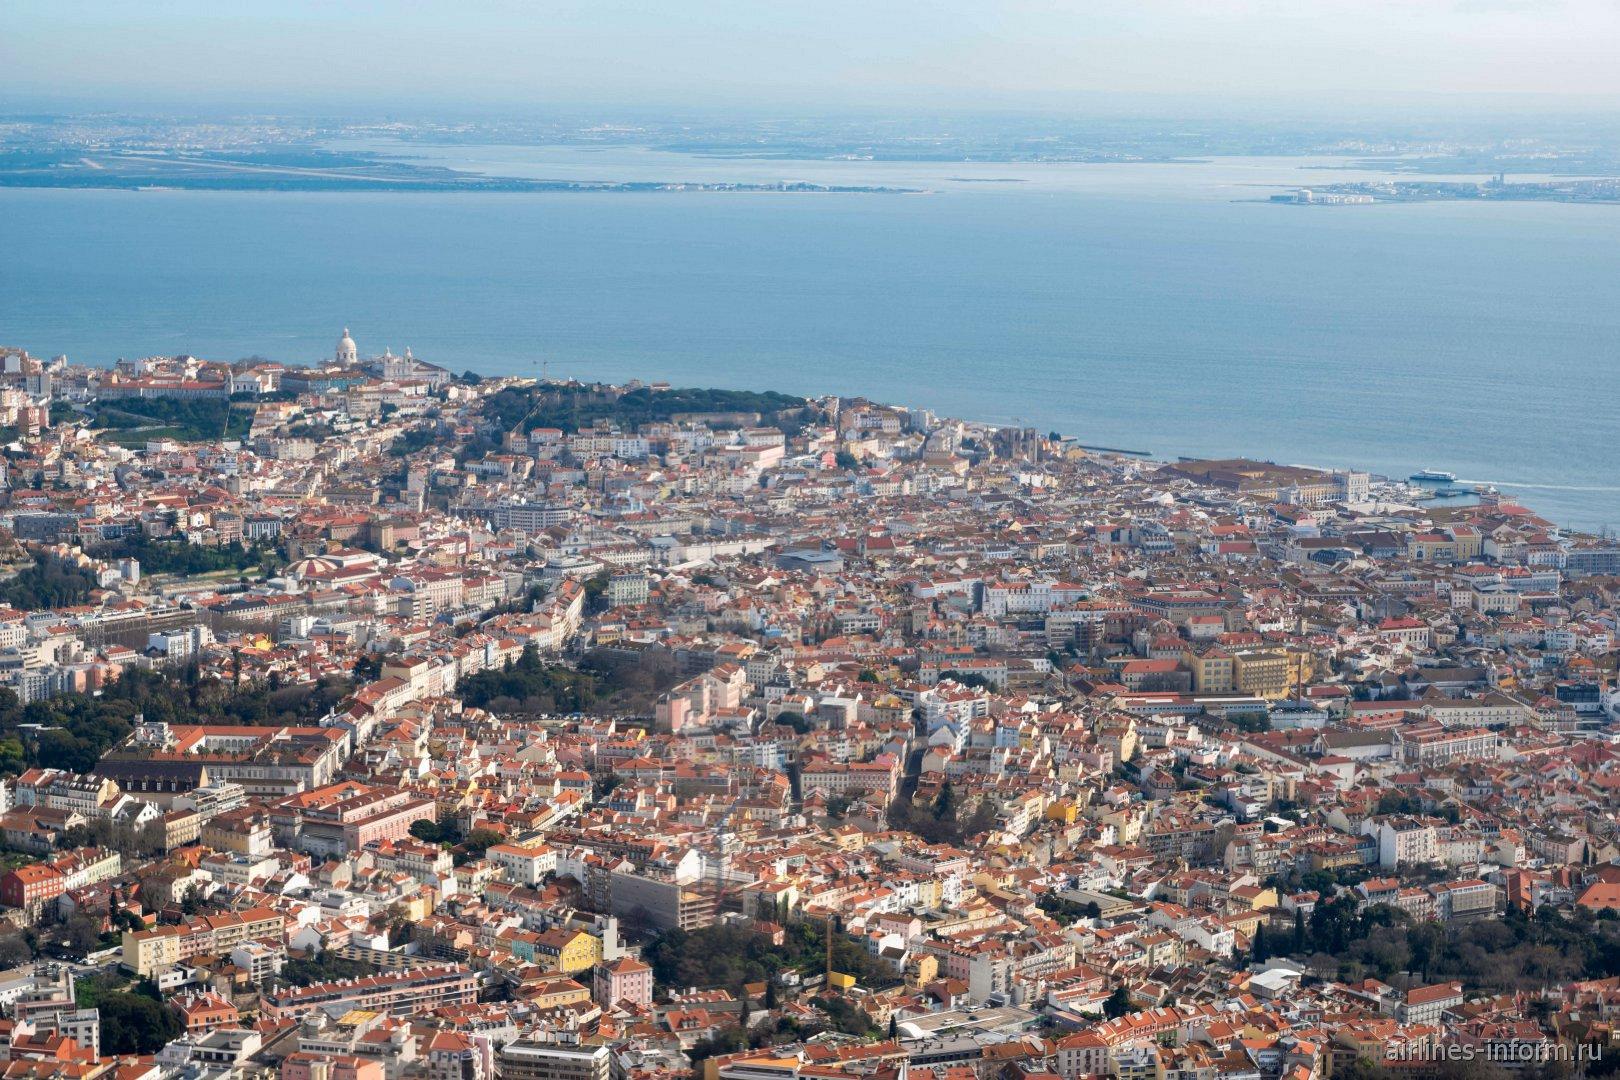 Вид из самолета на центр Лиссабона